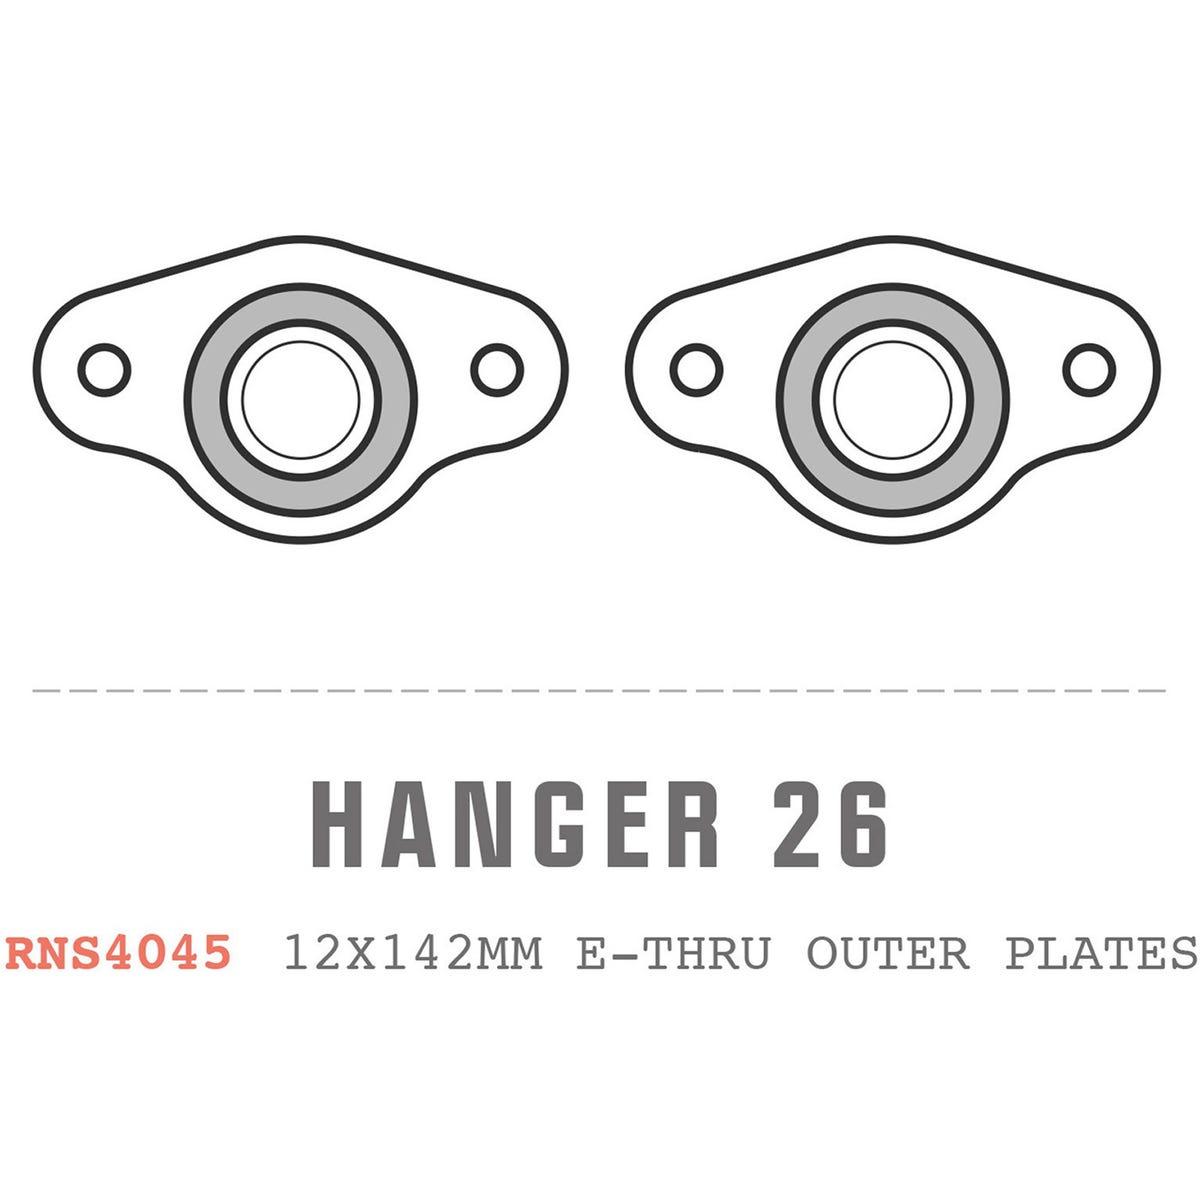 Saracen Hanger 26 fits: Carbon 12x142mm E-Thru outer plates